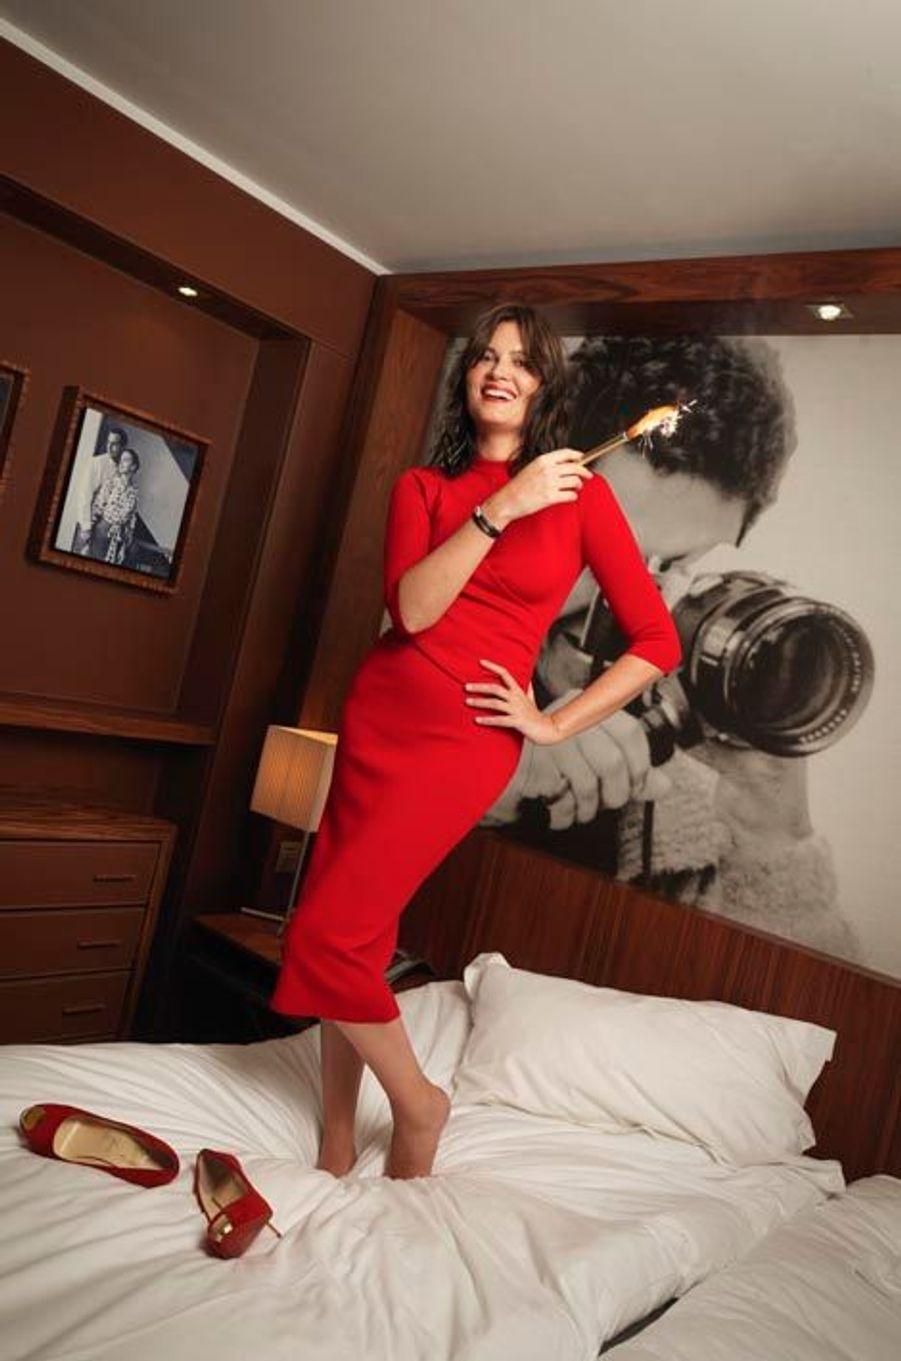 Marina Hands pose en robe rouge Dior, pieds nus debout sur un lit.